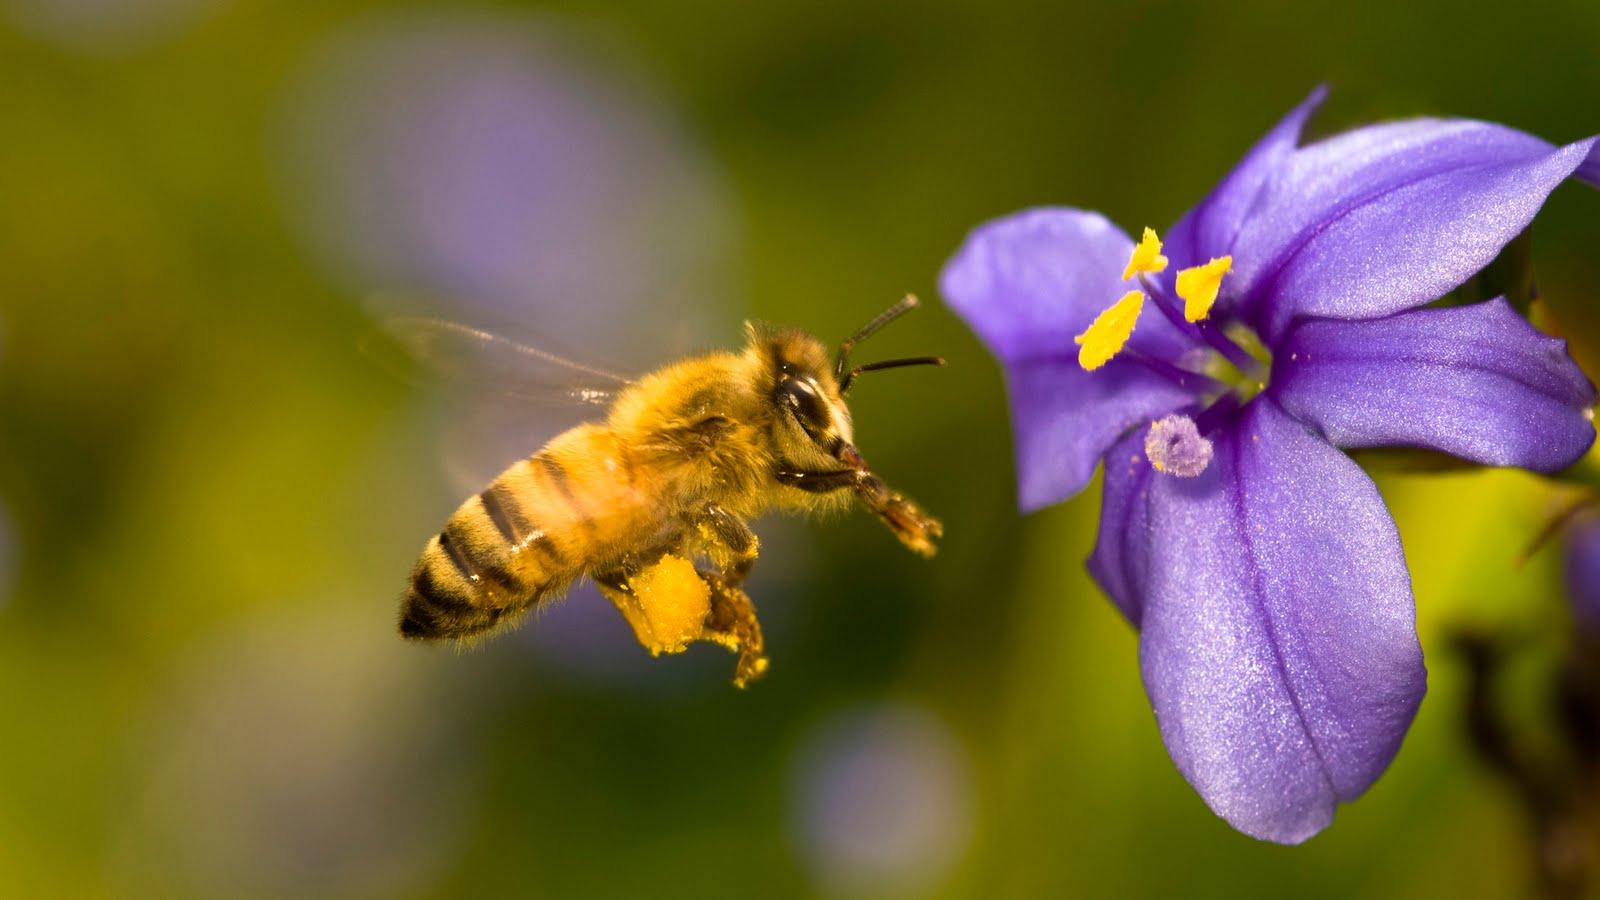 abeja libando flor